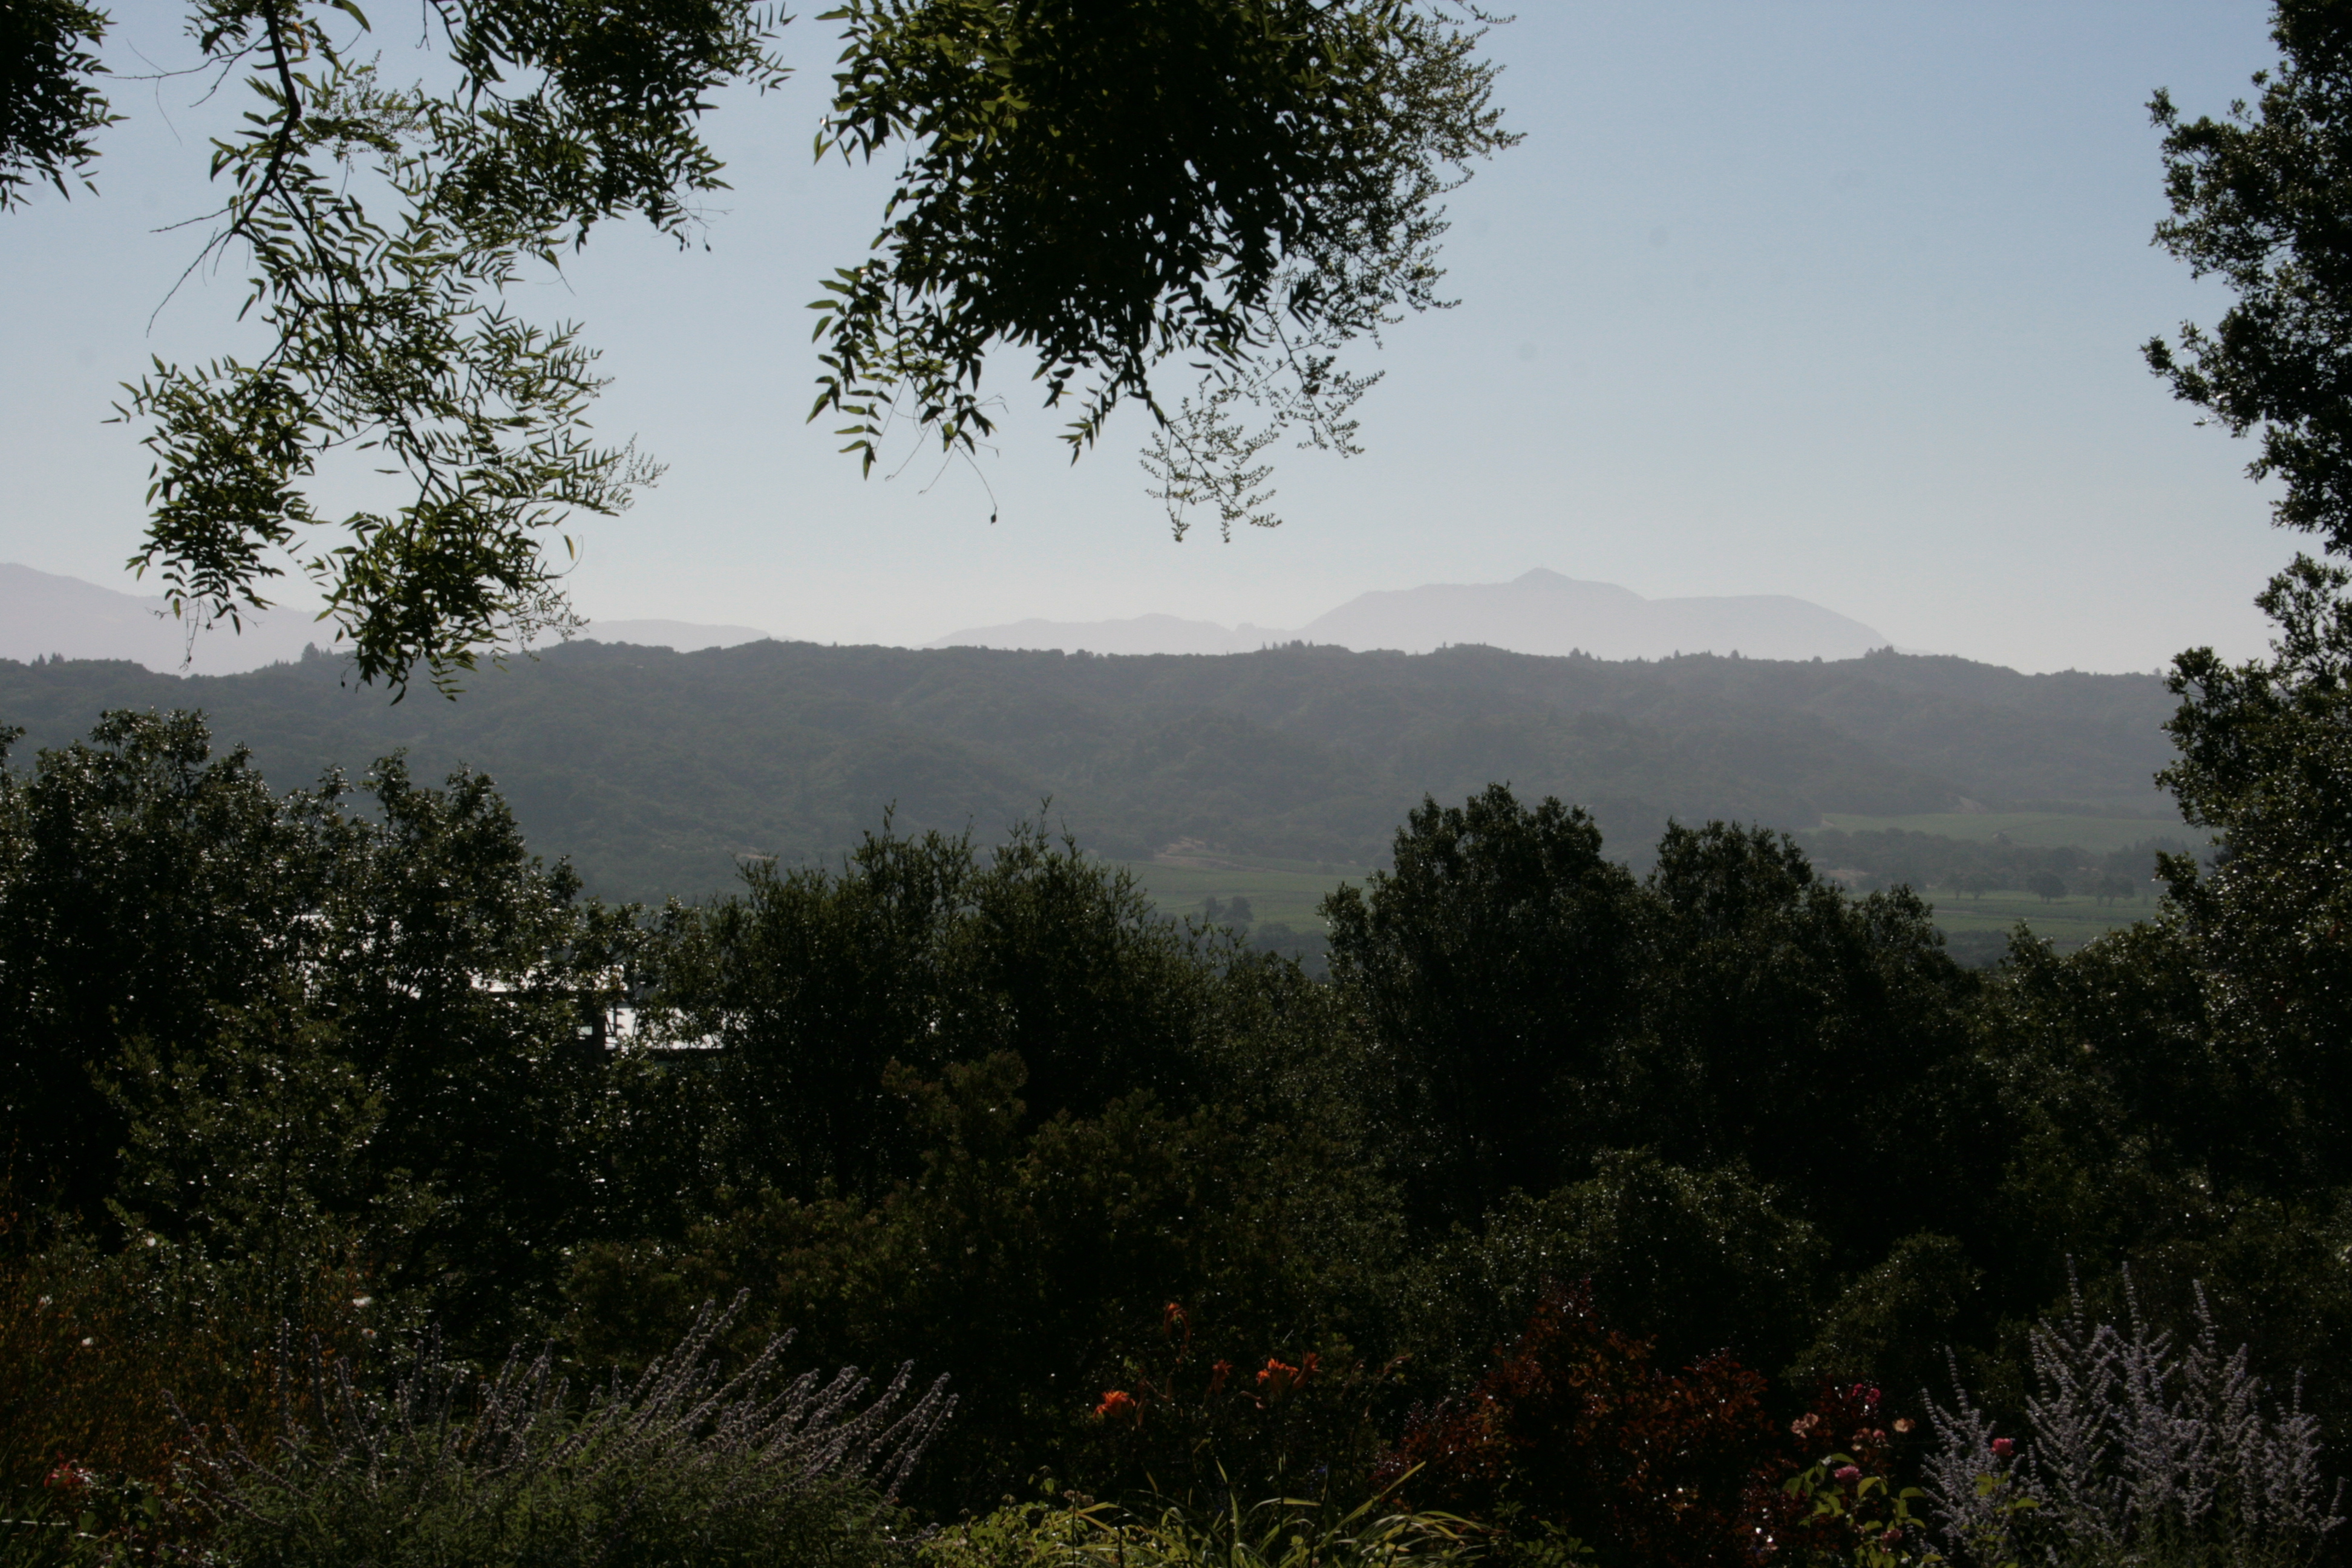 2013-07-05 10.37.00